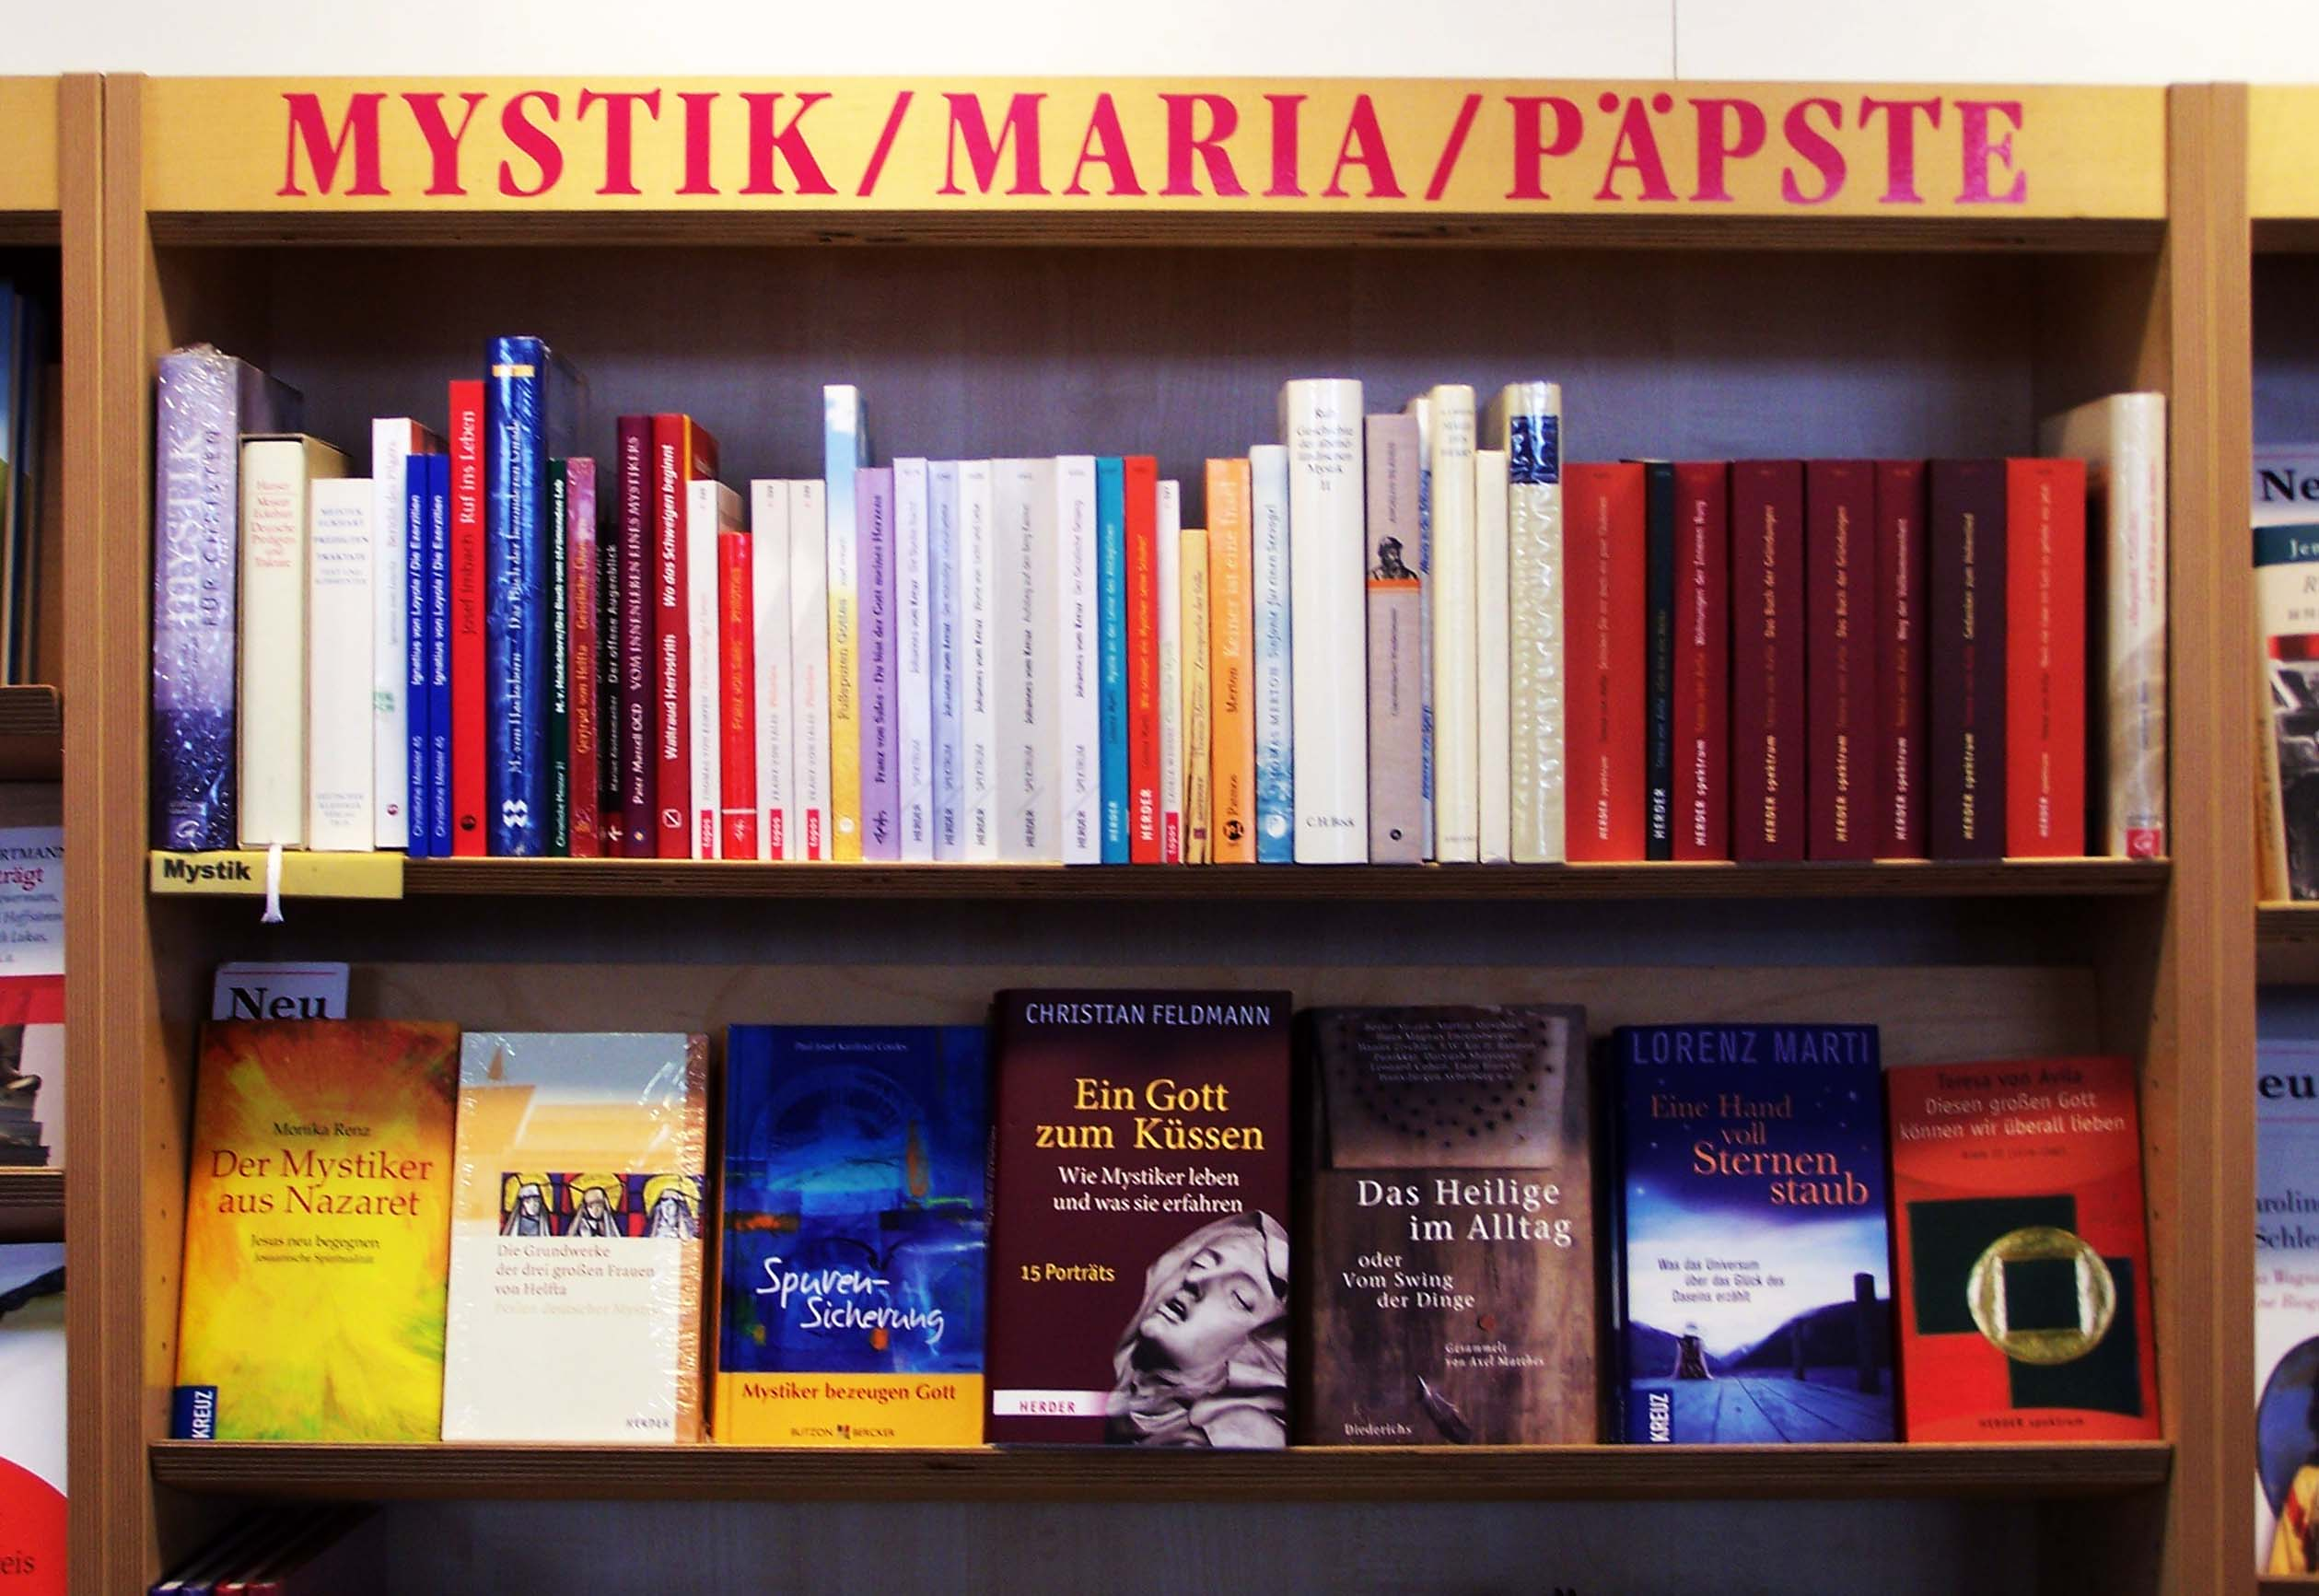 Dombuchhandlung München, Mystik Maria Päpste